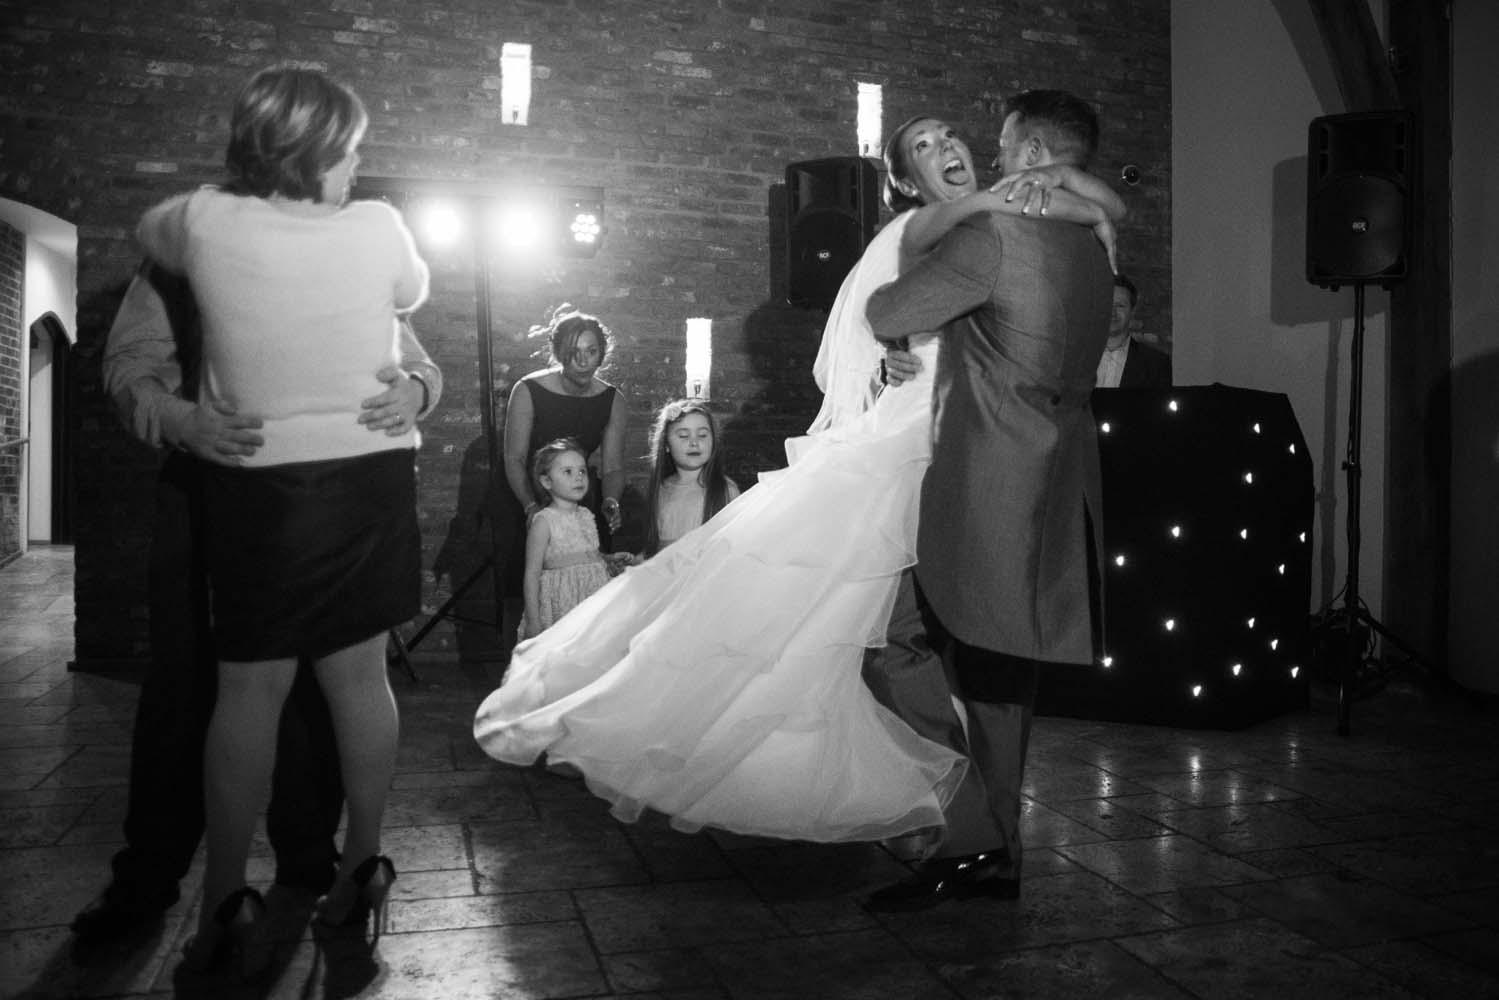 wedding photo 11 (13 of 30).jpg